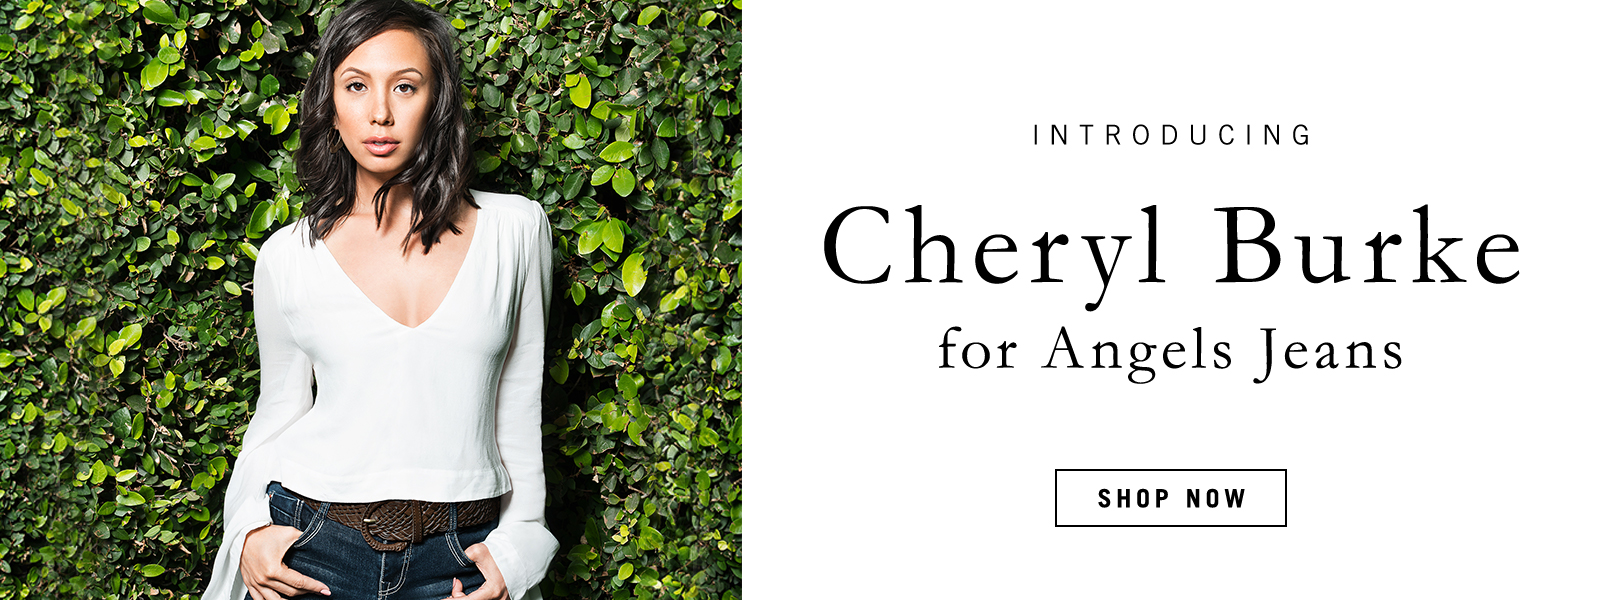 Cheryl Burke Jeans